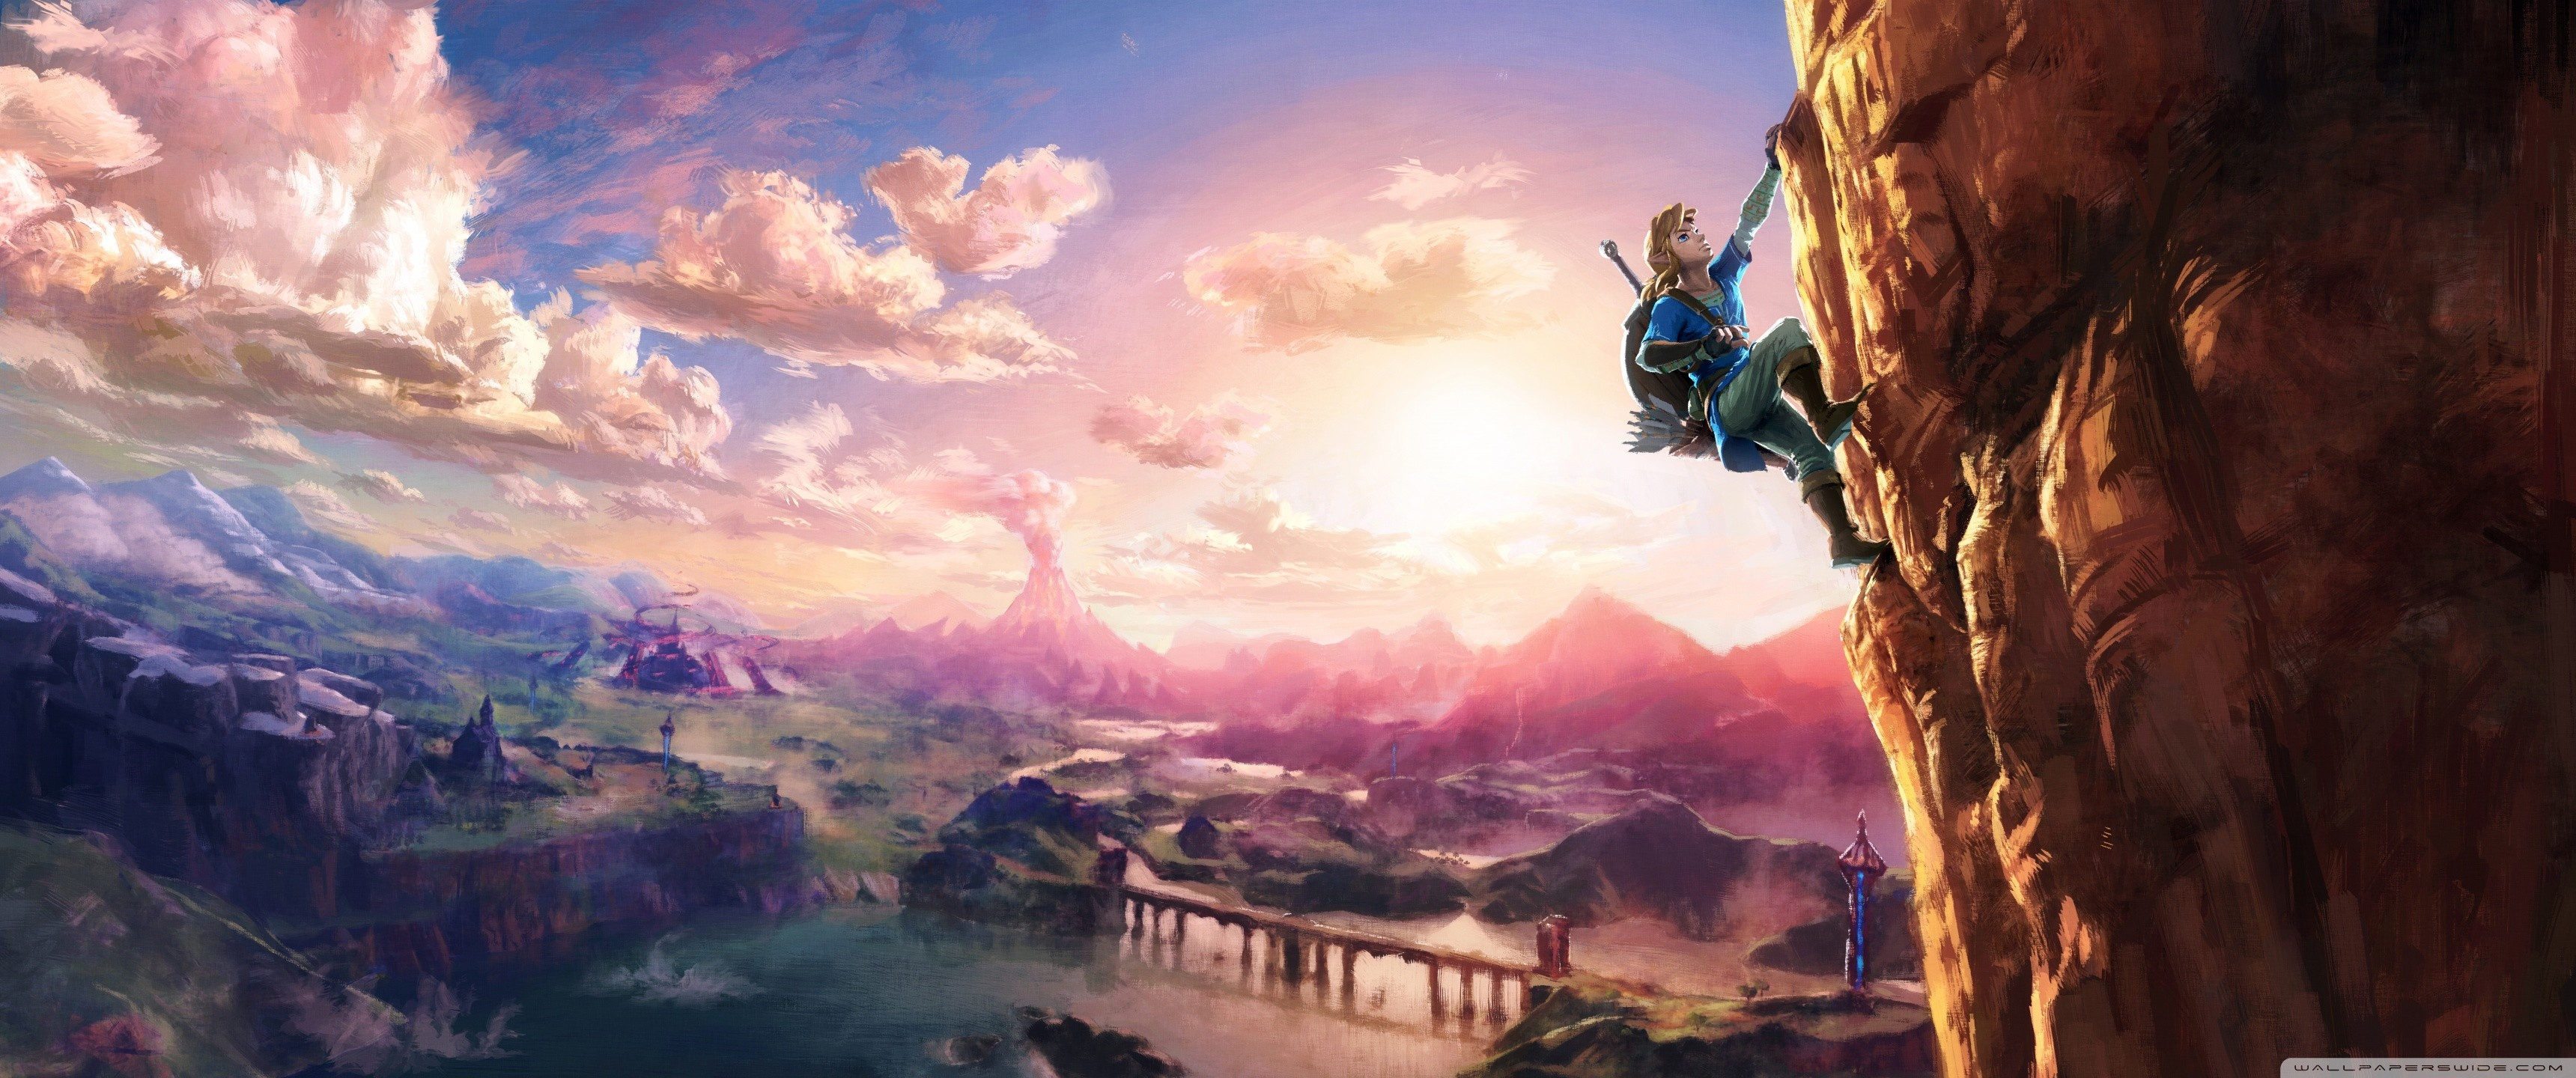 2560x1080 Final Fantasy Xv Artwork 2560x1080 Resolution Hd: 3440 X 1440 Wallpaper 21:9 (68+ Images